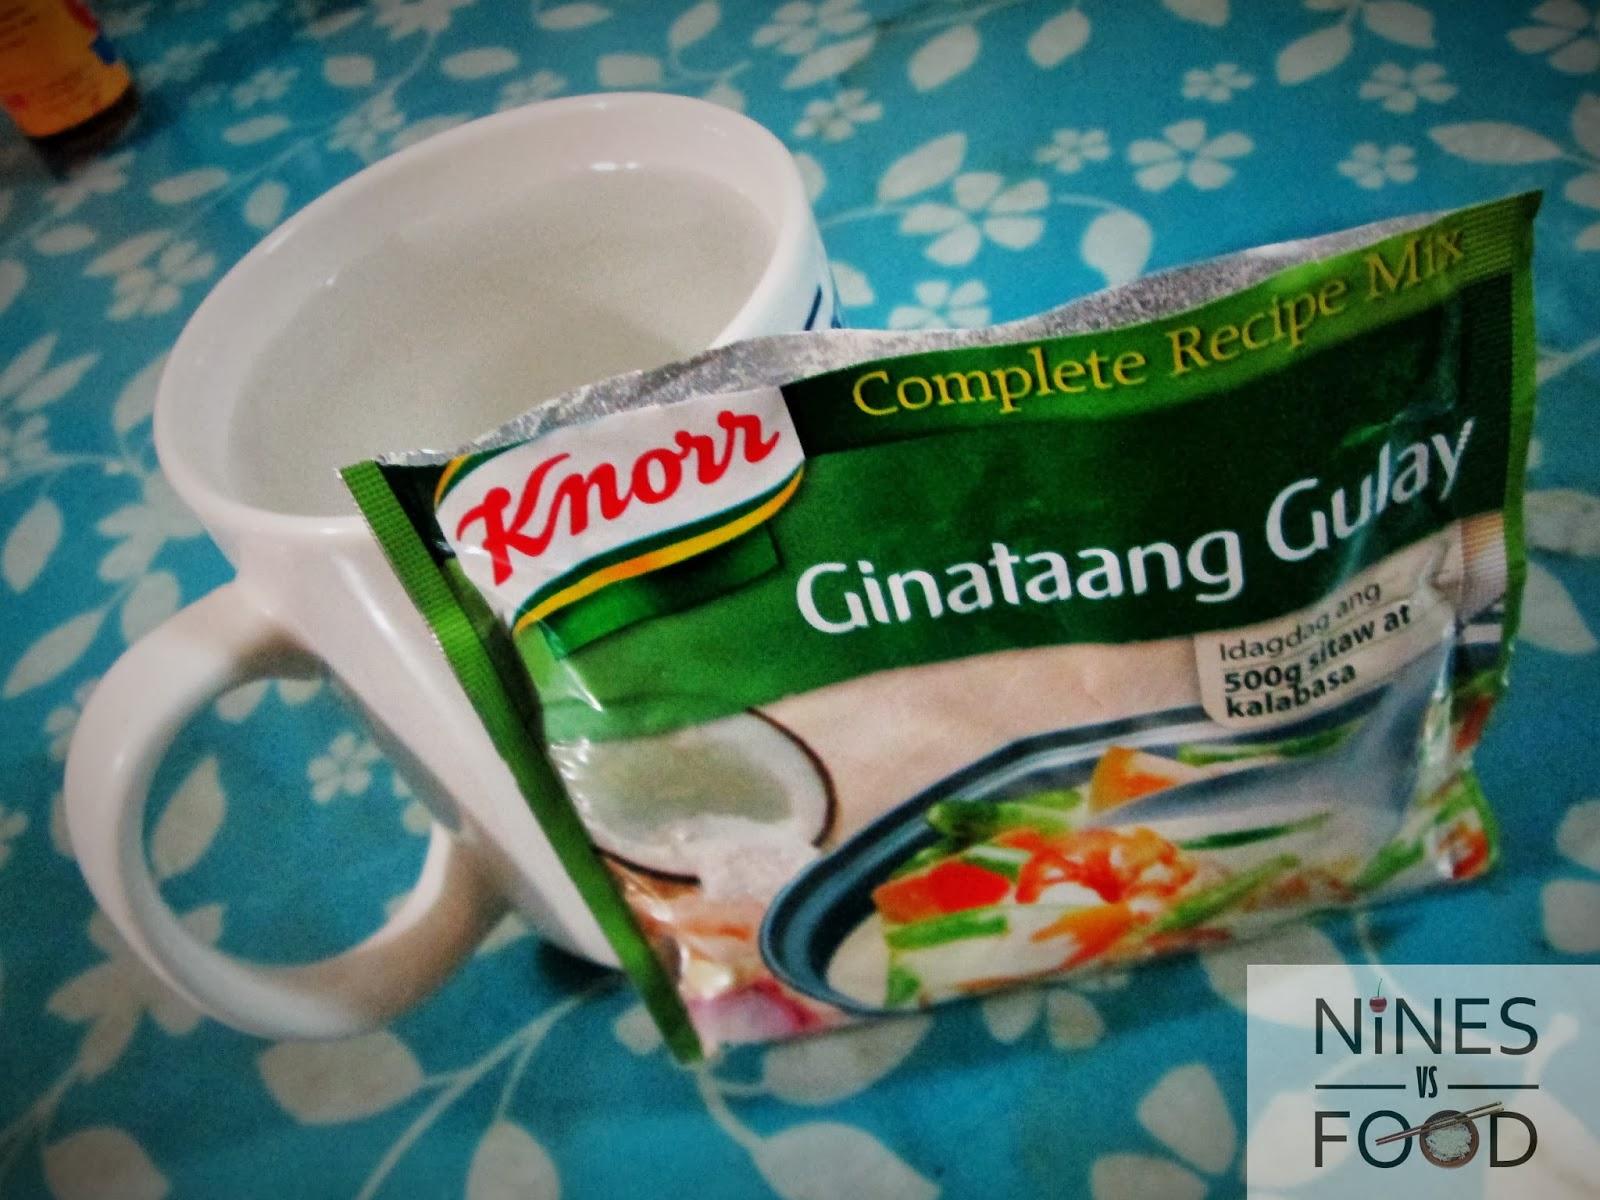 Nines vs. Food - How To Make Ginataang Gulay with Pig Ears-3.jpg